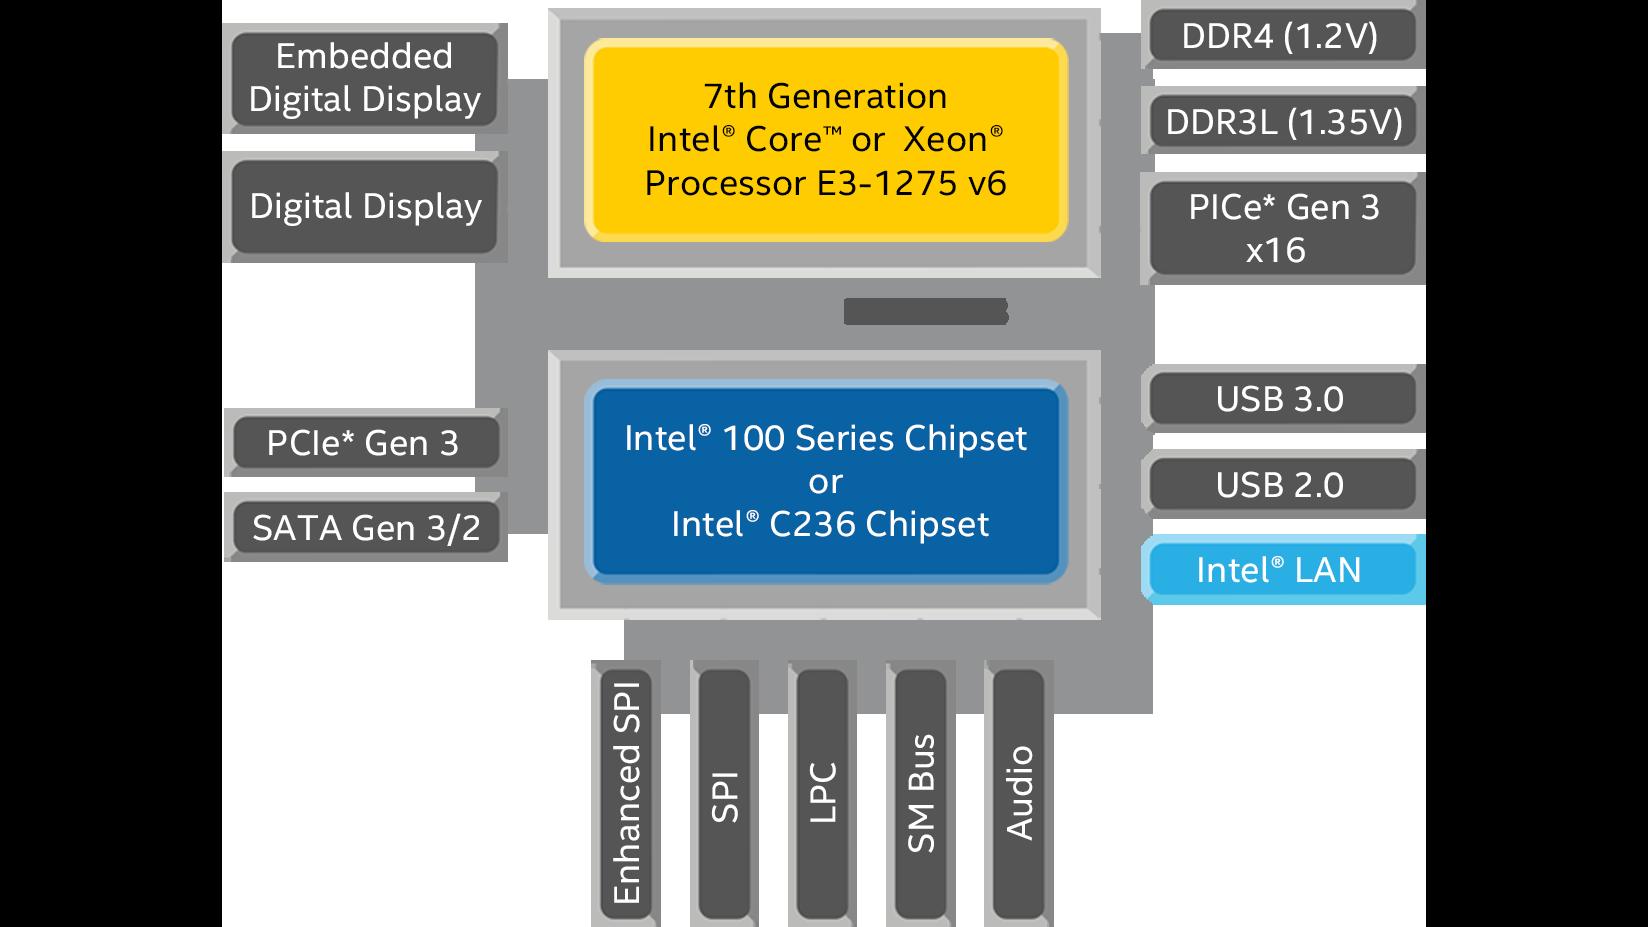 pentium 2 block diagram 7th generation intel   core    desktop processor specifications  7th generation intel   core    desktop processor specifications